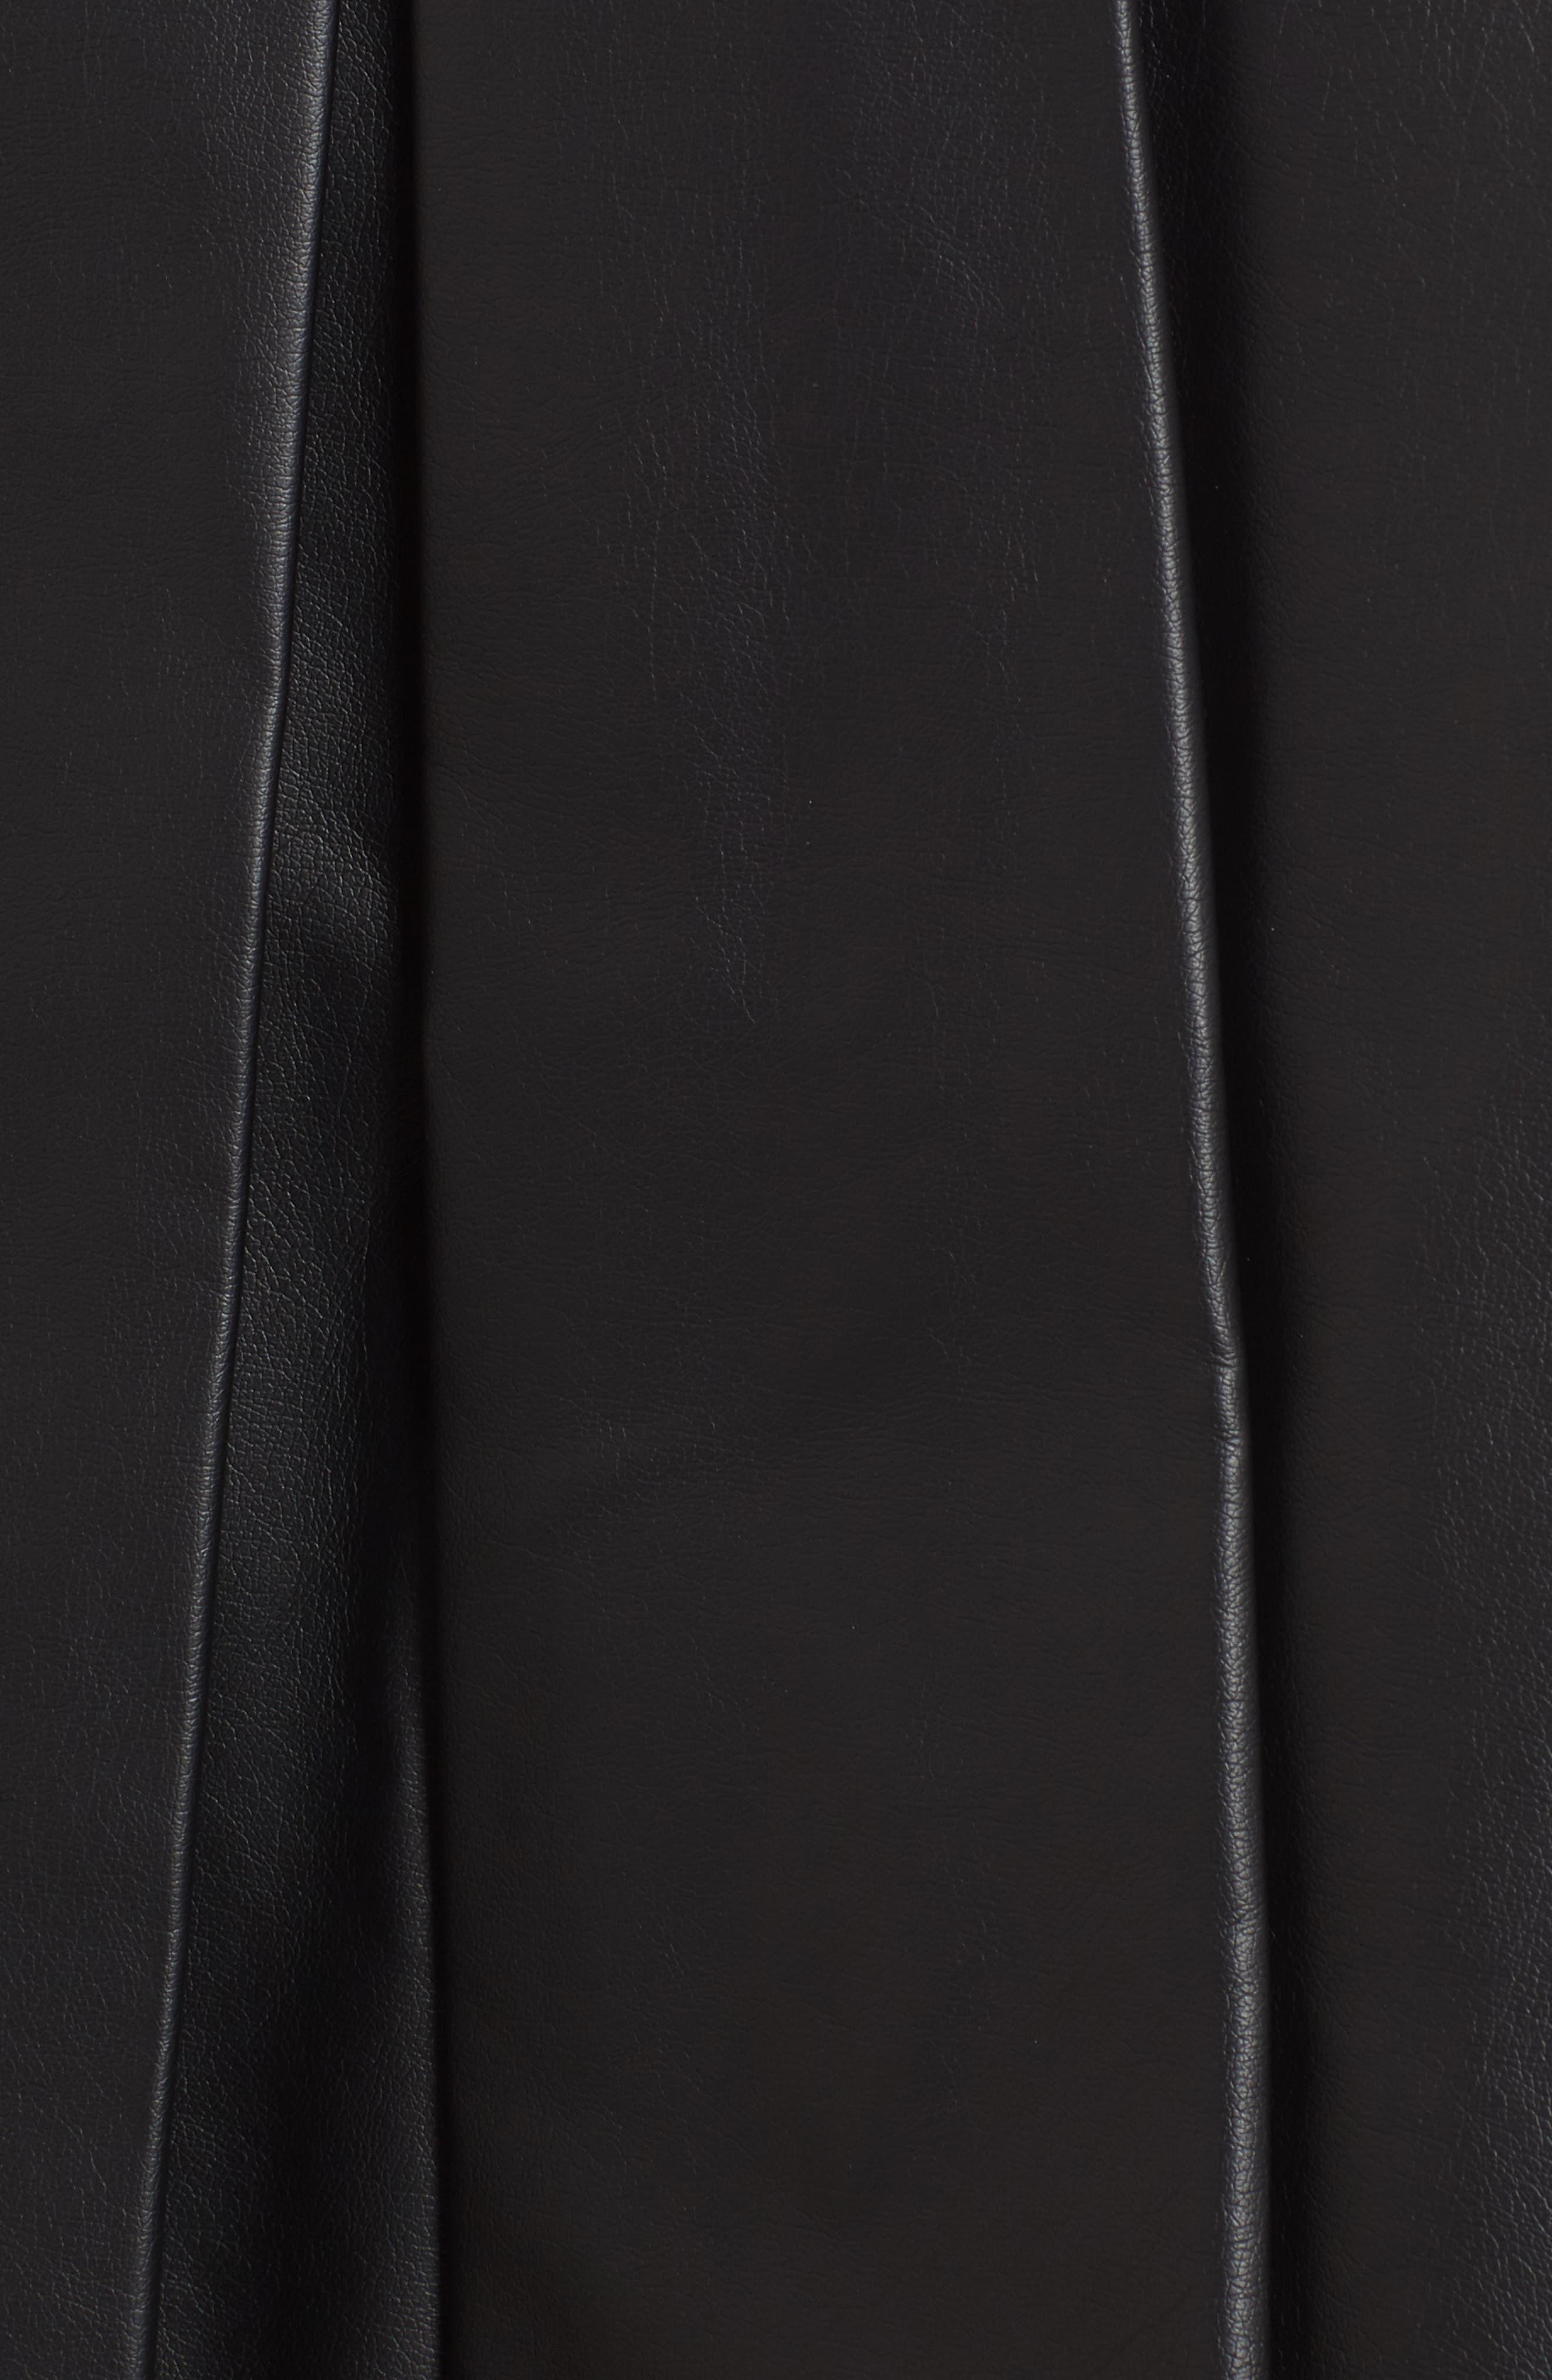 Pleat Faux Leather Skirt,                             Alternate thumbnail 5, color,                             001